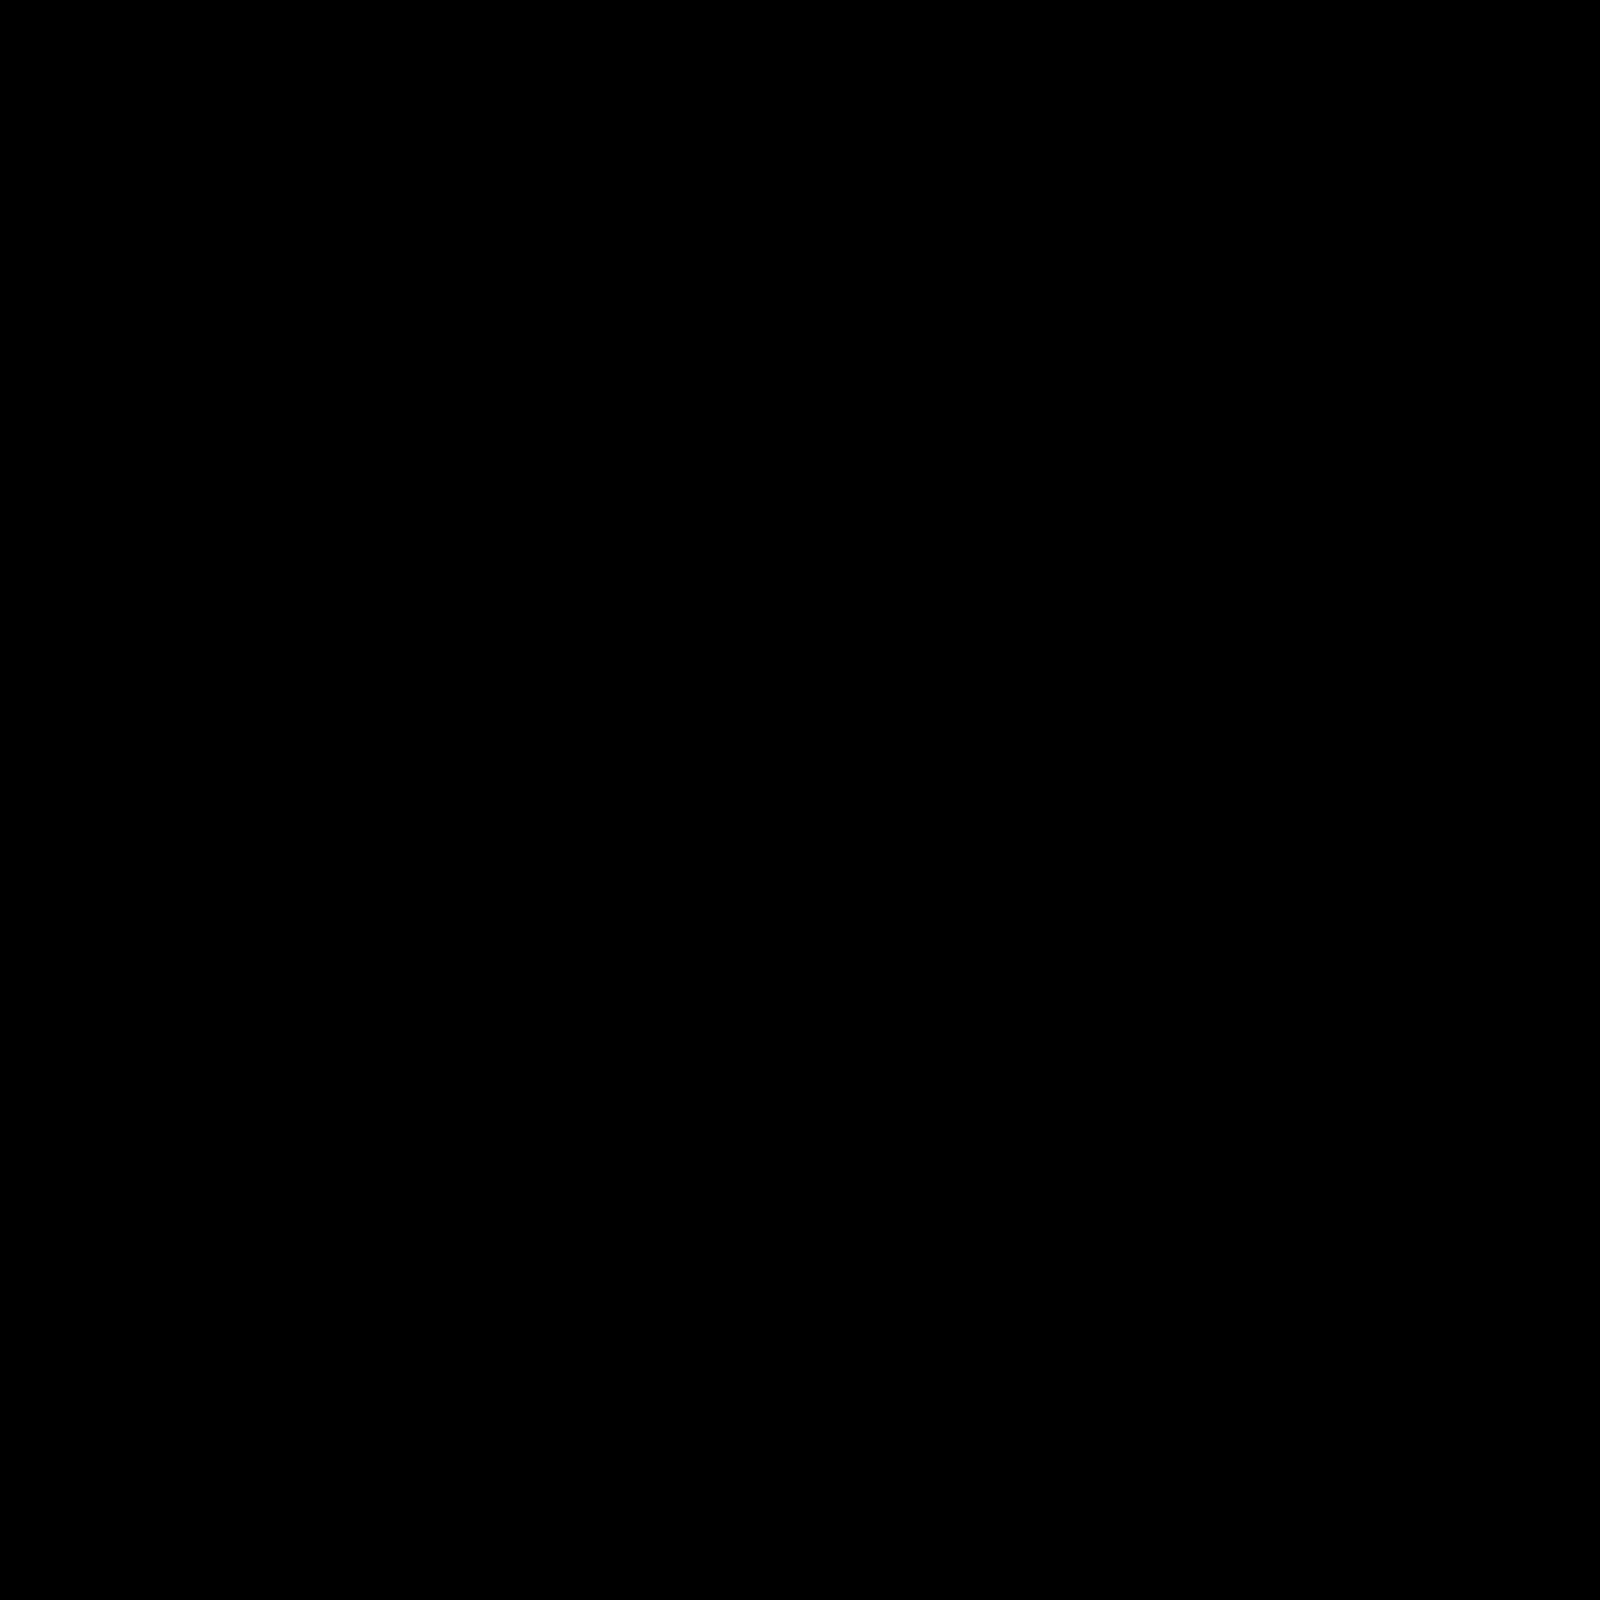 Fett gedruckt icon